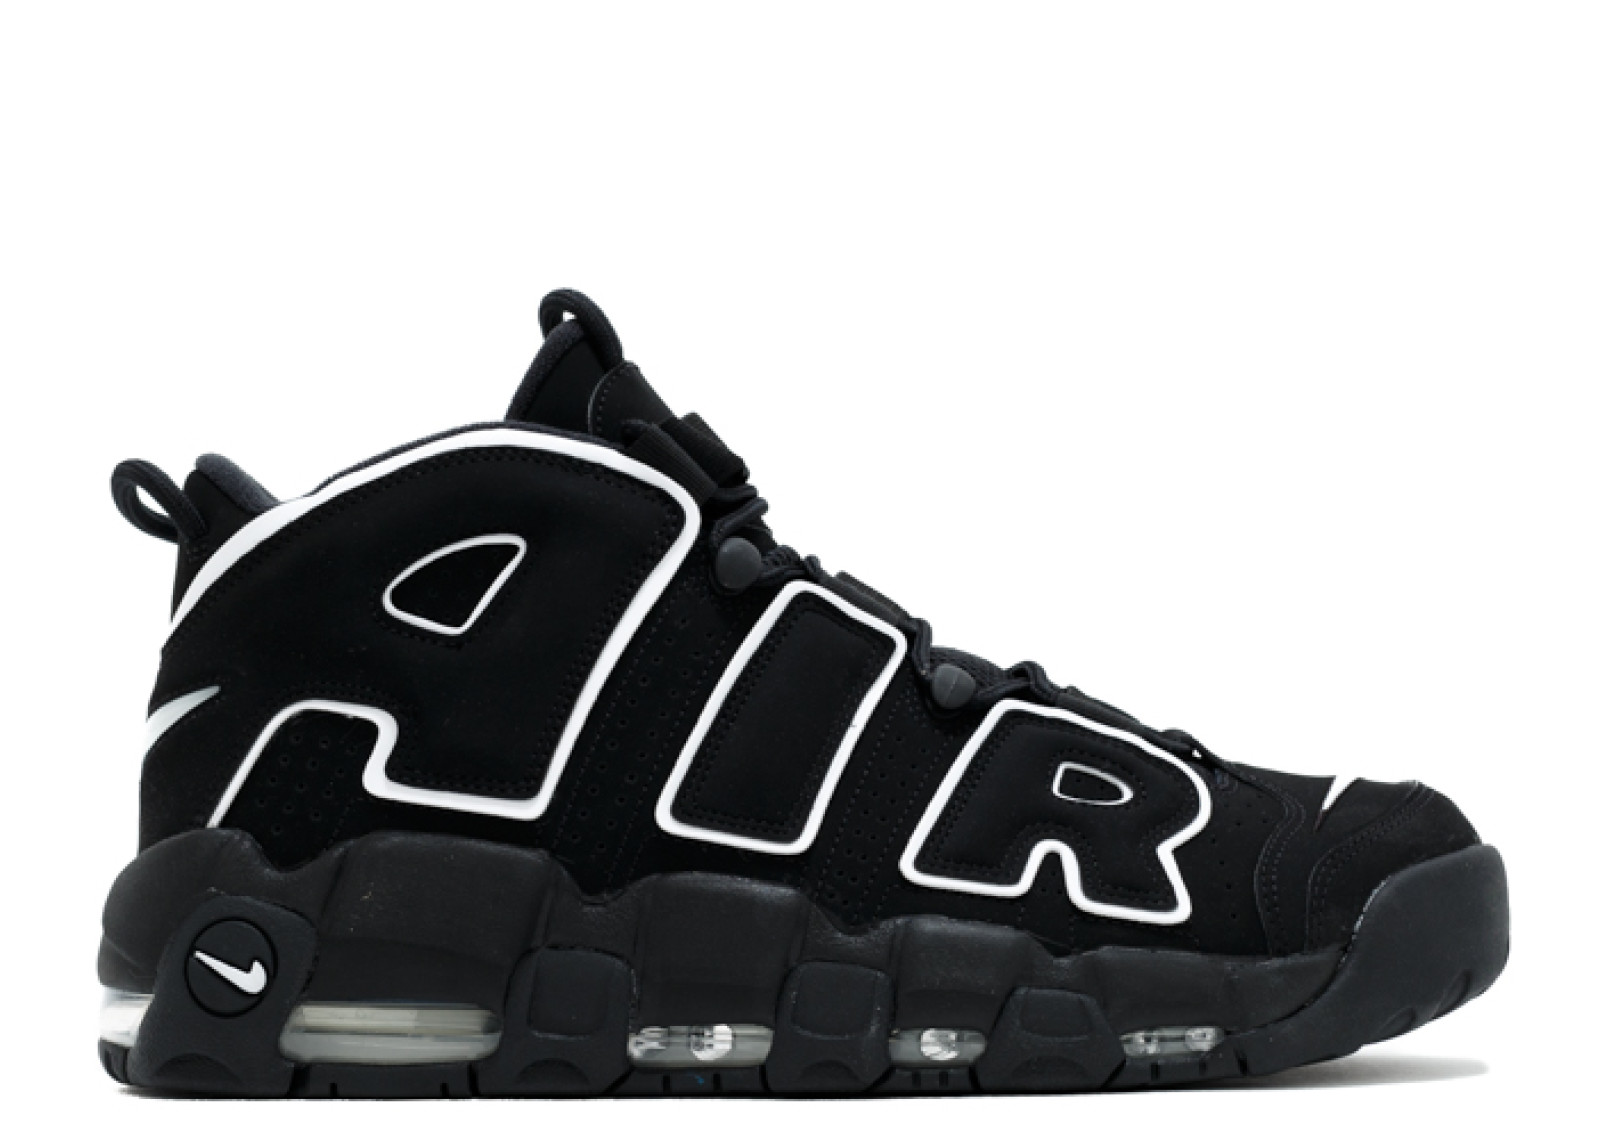 Nike Air Basketball: Nike Air More Uptempo Basketball Unisex Shoes Black White